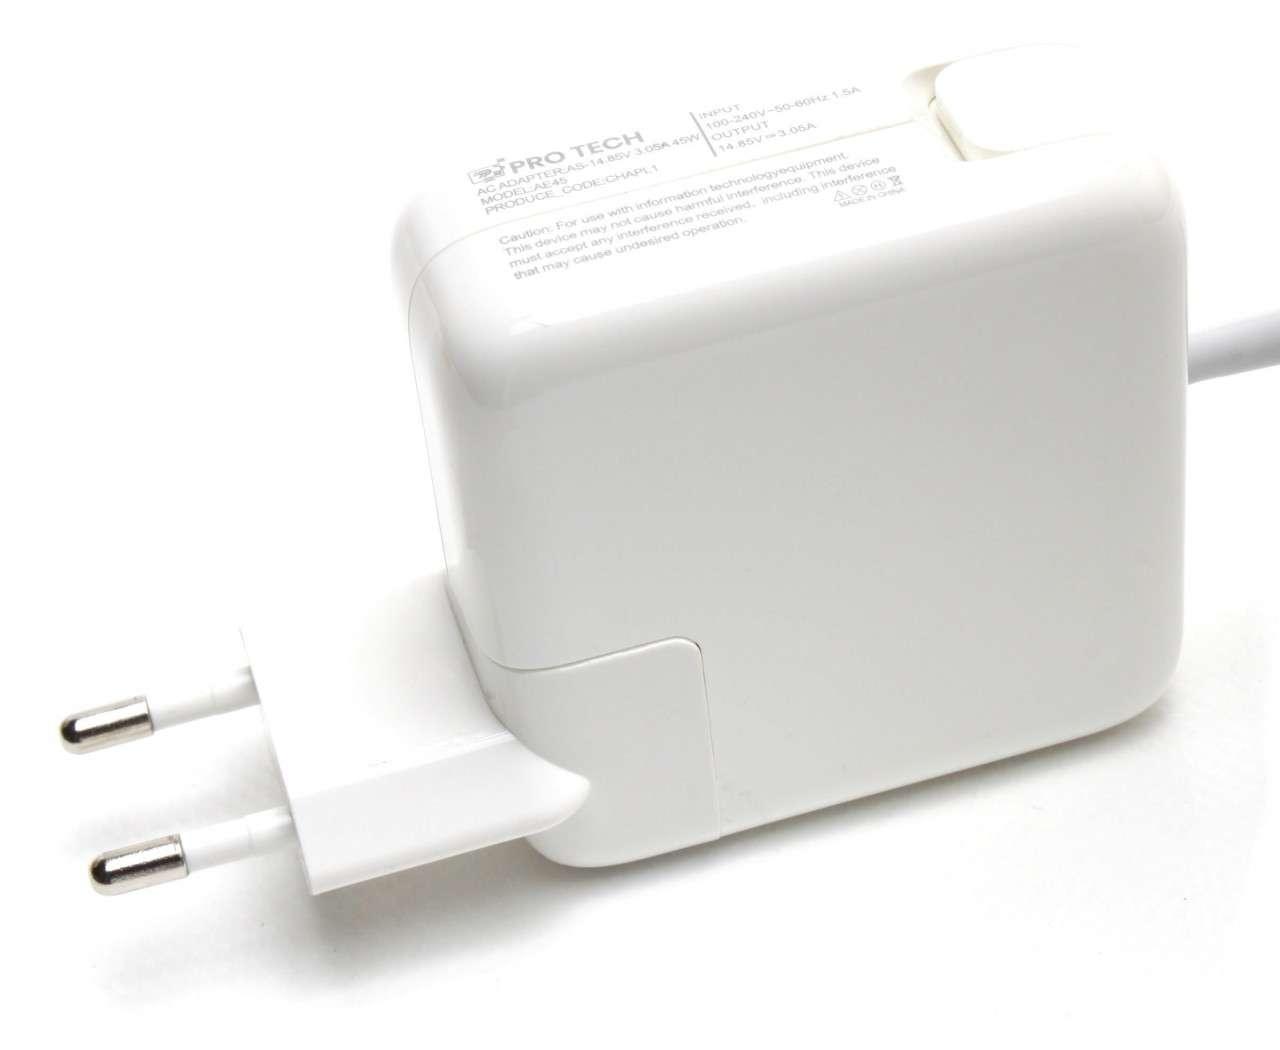 Incarcator Apple MacBook Air 13 inch Late 2012 45W Replacement imagine powerlaptop.ro 2021